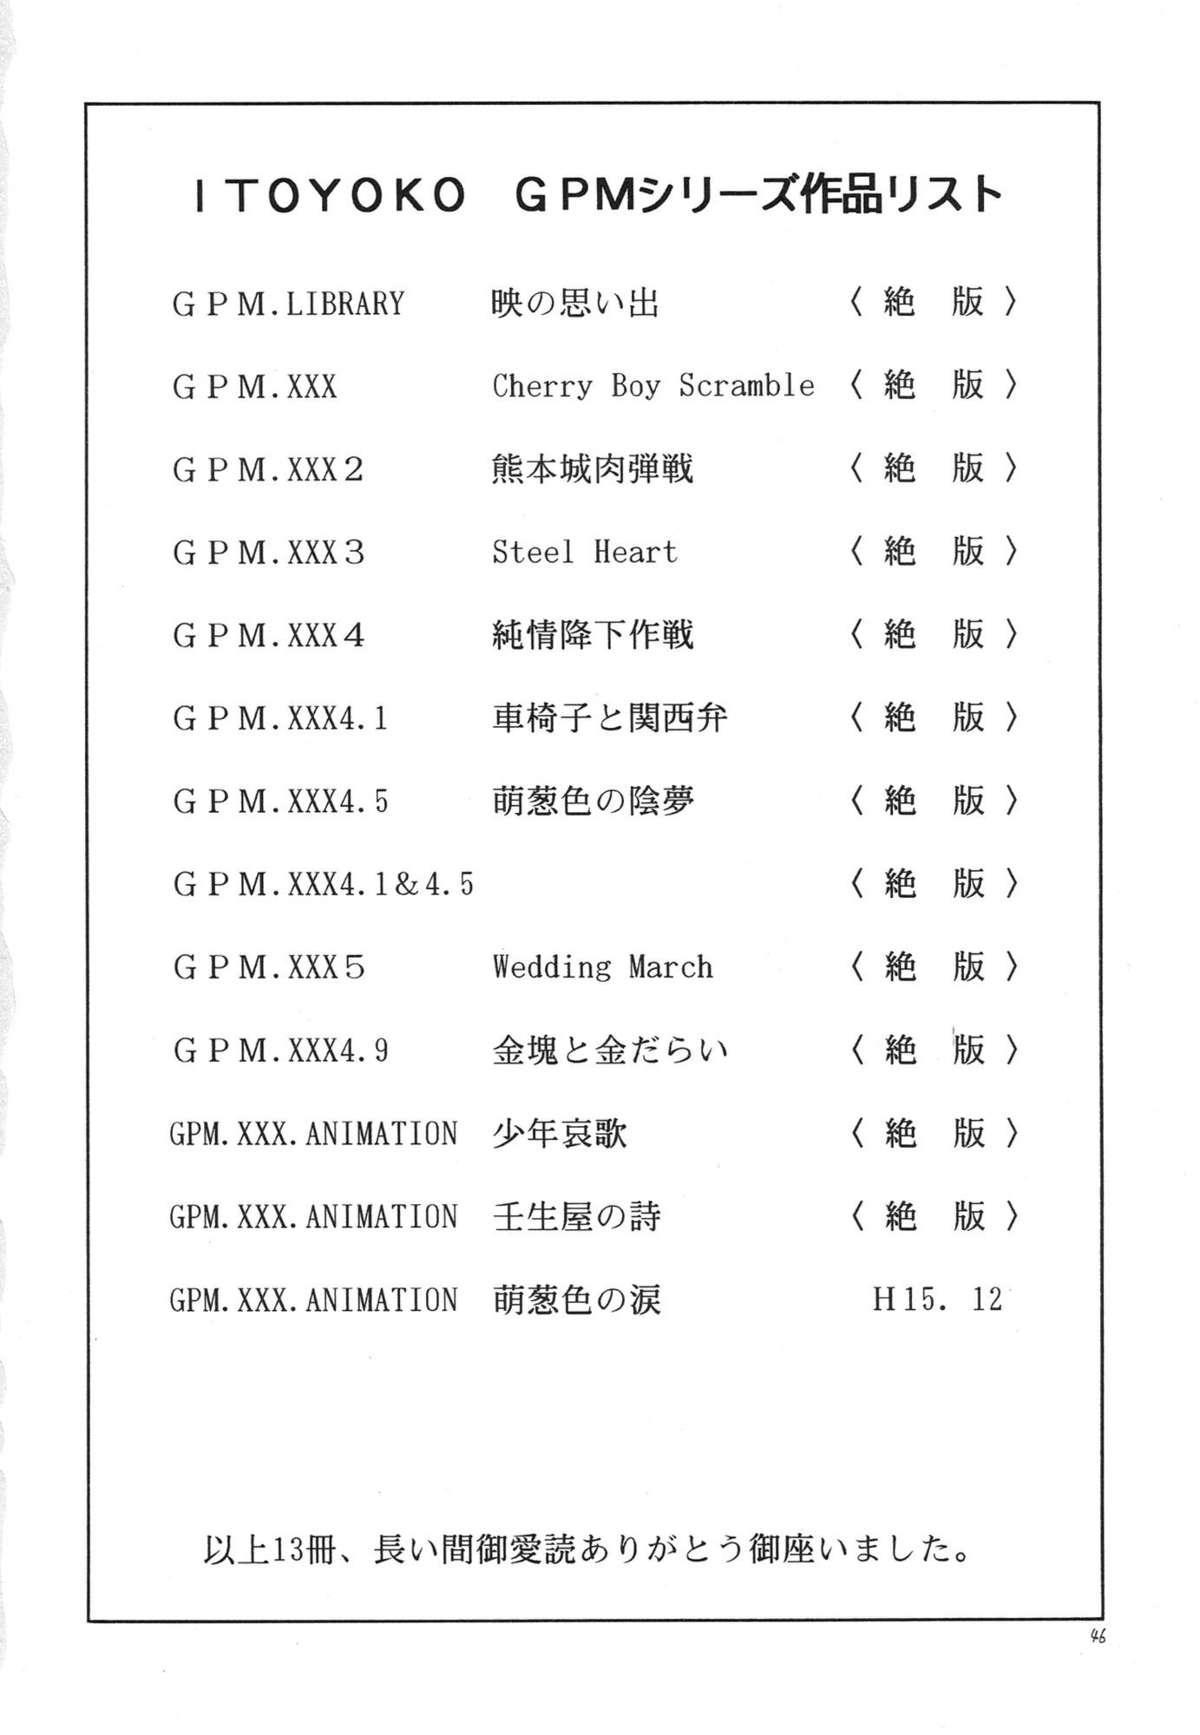 GPM.XXX Animation Moegiiro no Namida - Tear Drops 47